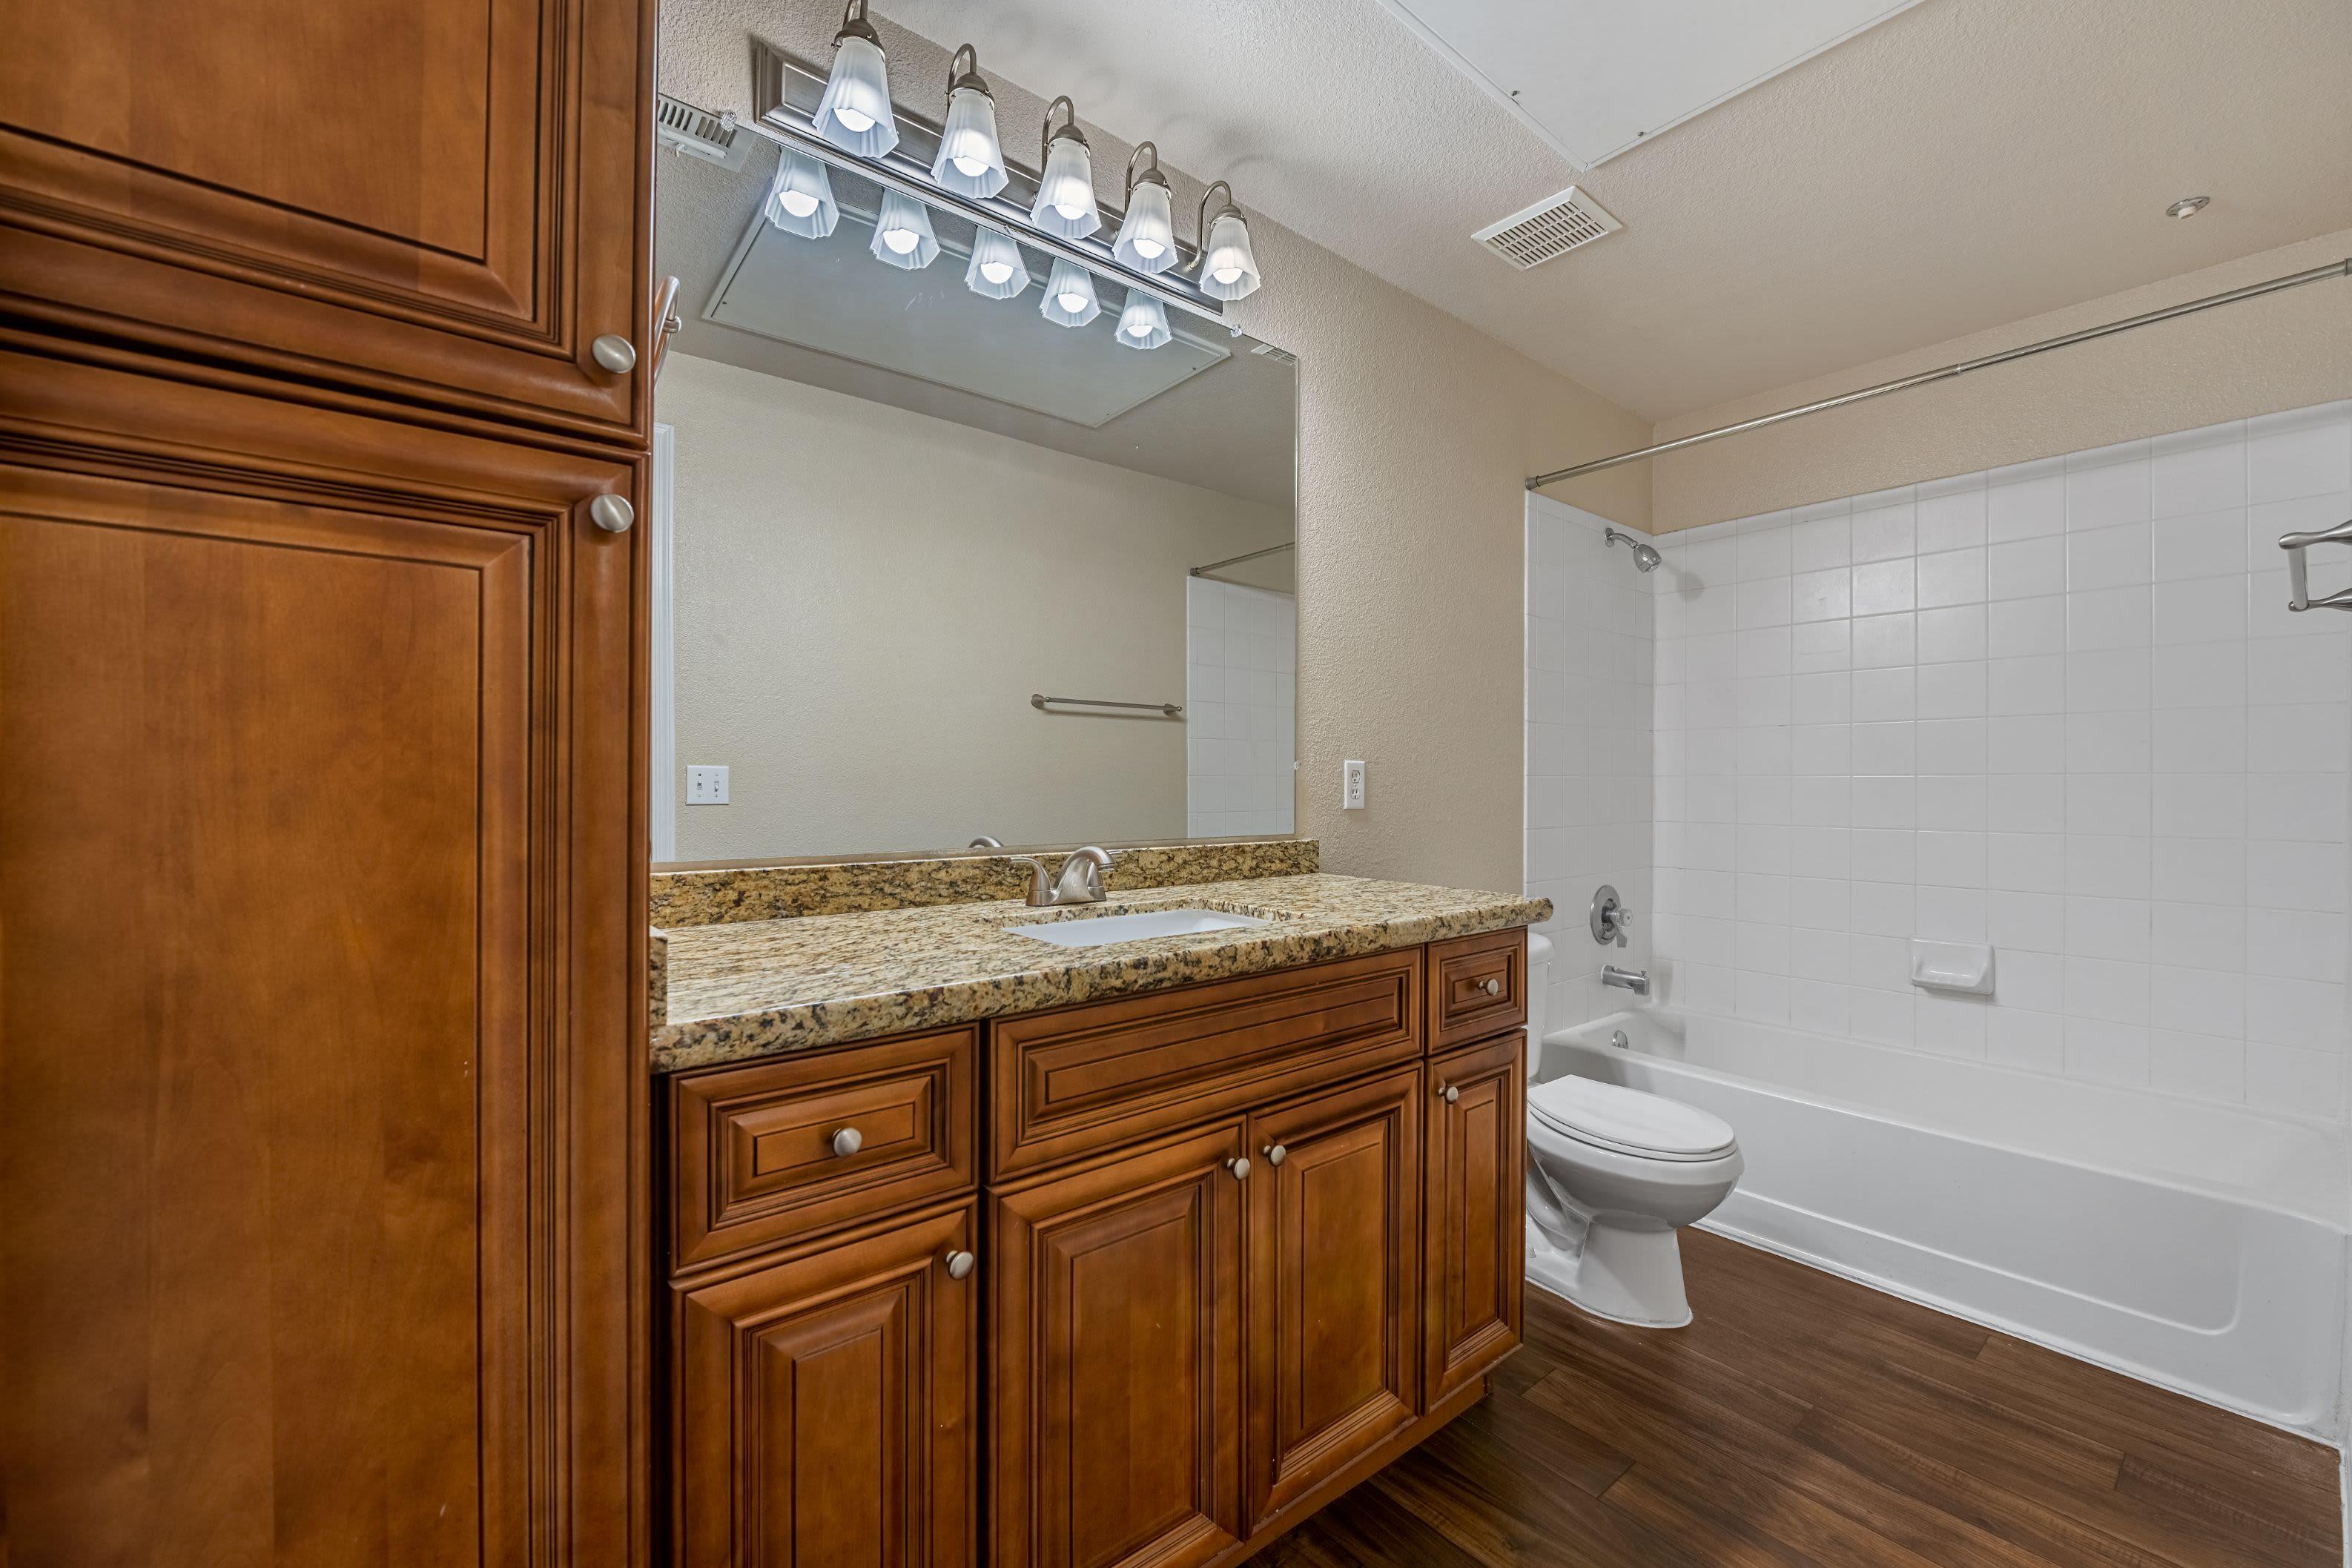 Spacious bathroom with generous storage at Azure Creek in Cave Creek, Arizona